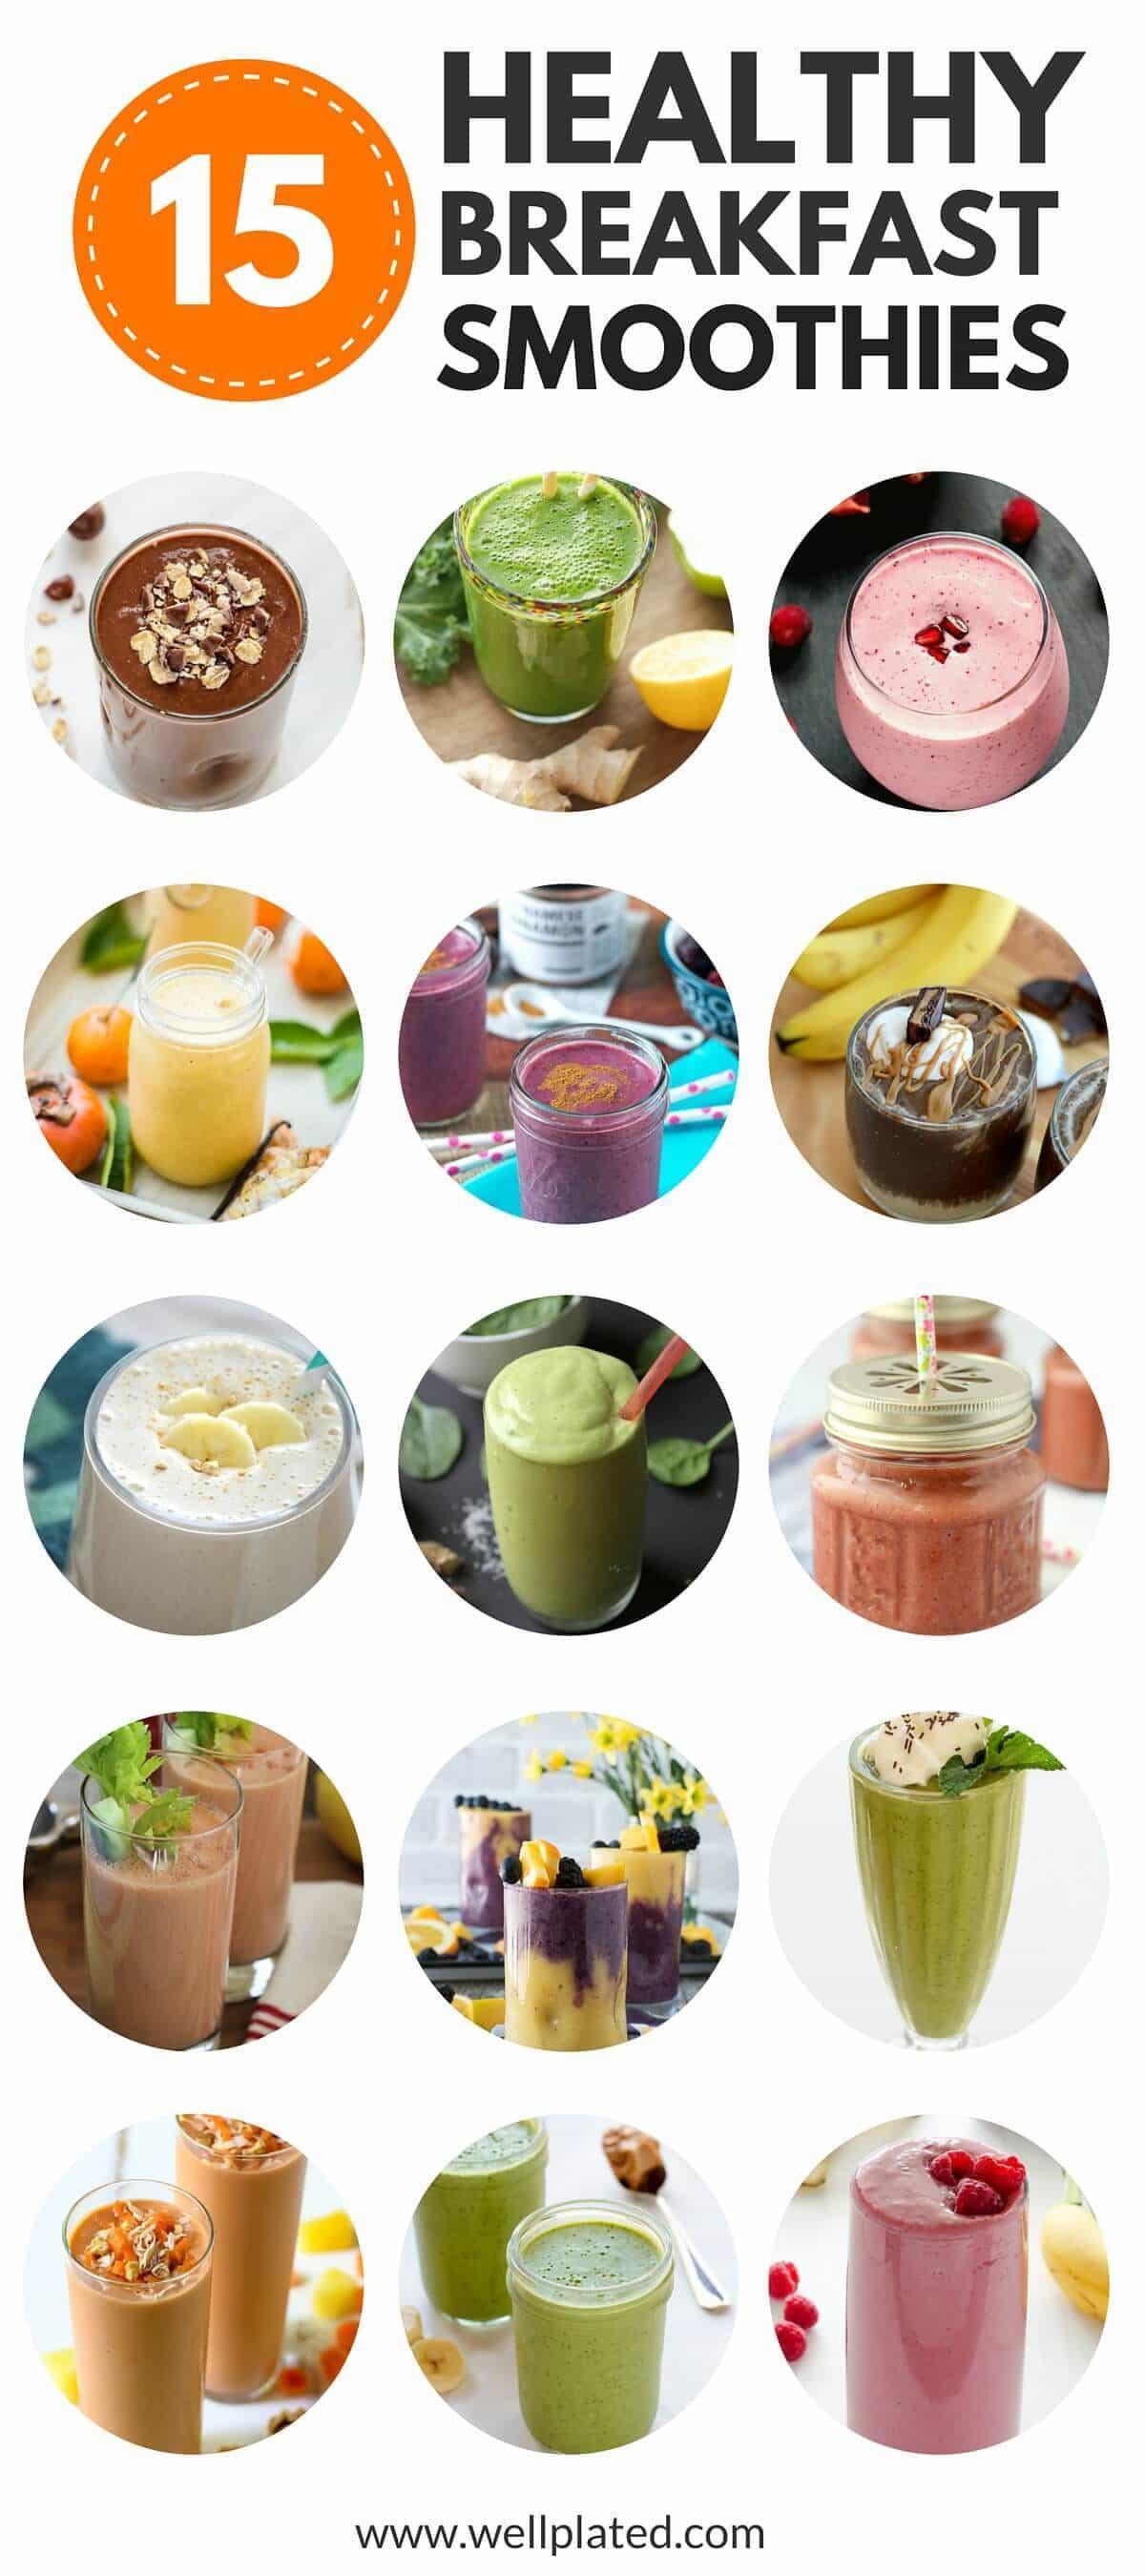 Breakfast Healthy Smoothies  The Best 15 Healthy Breakfast Smoothies